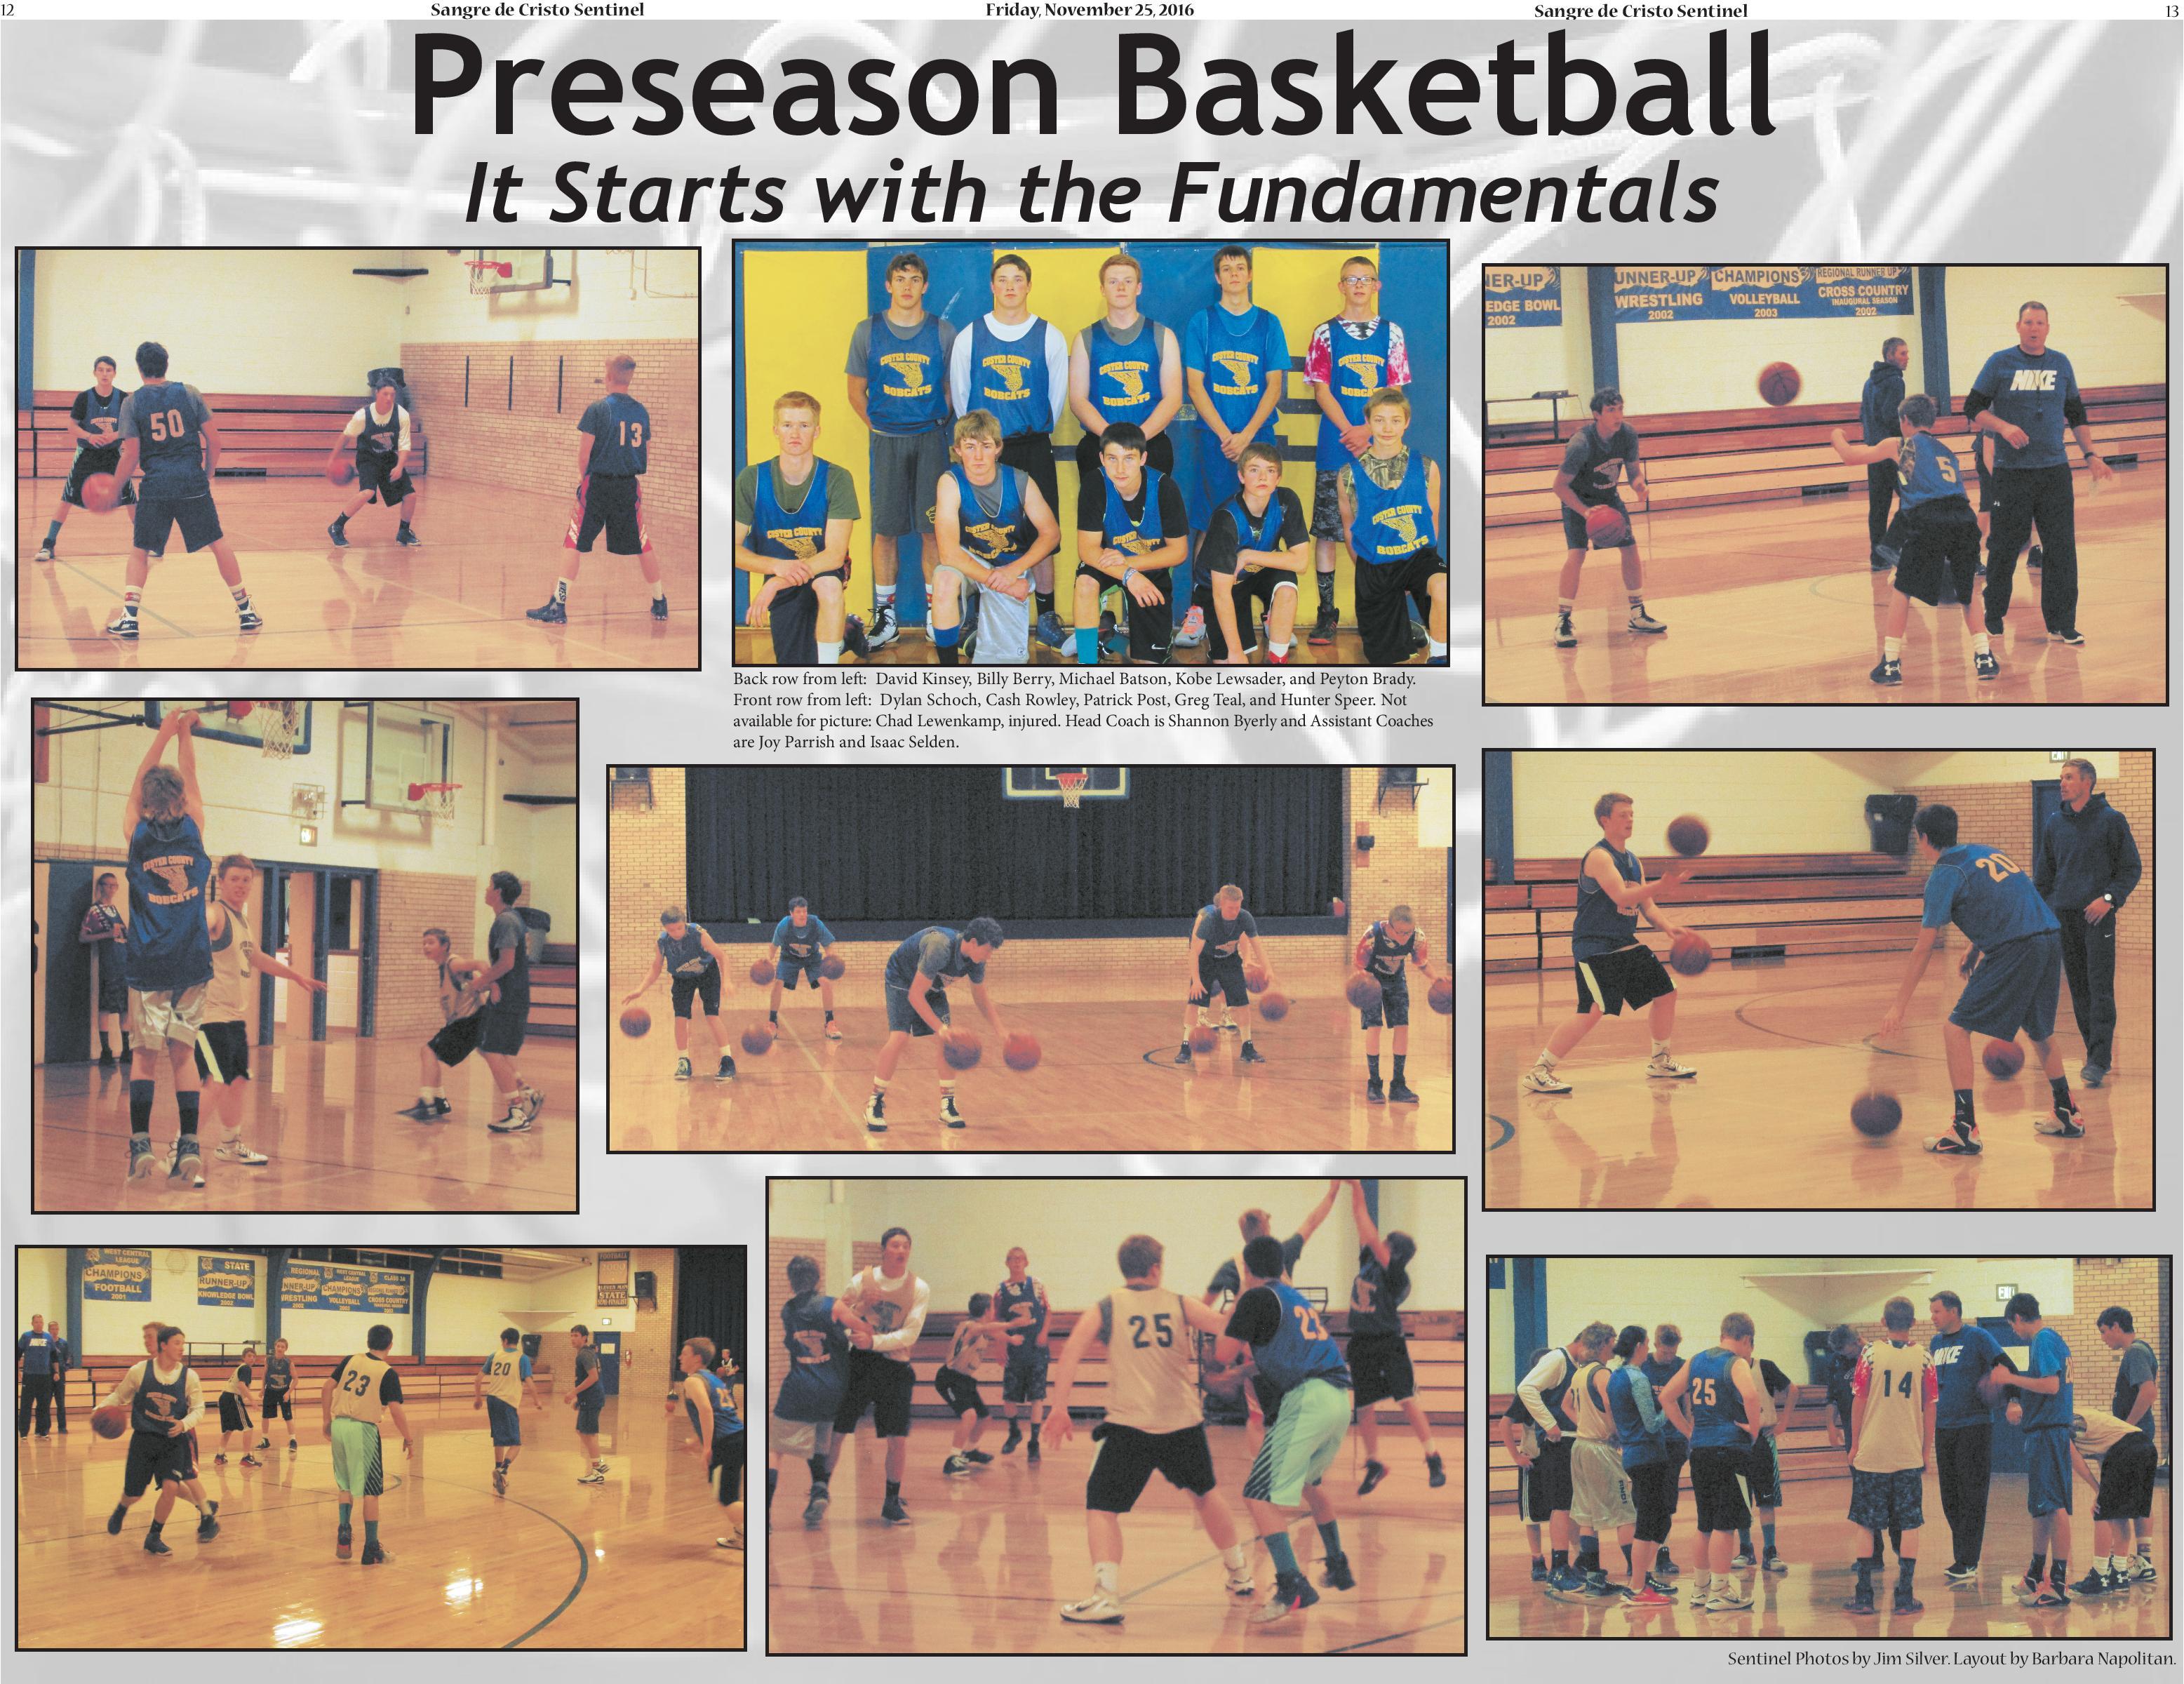 112516-preseason-basketball-dt-revised